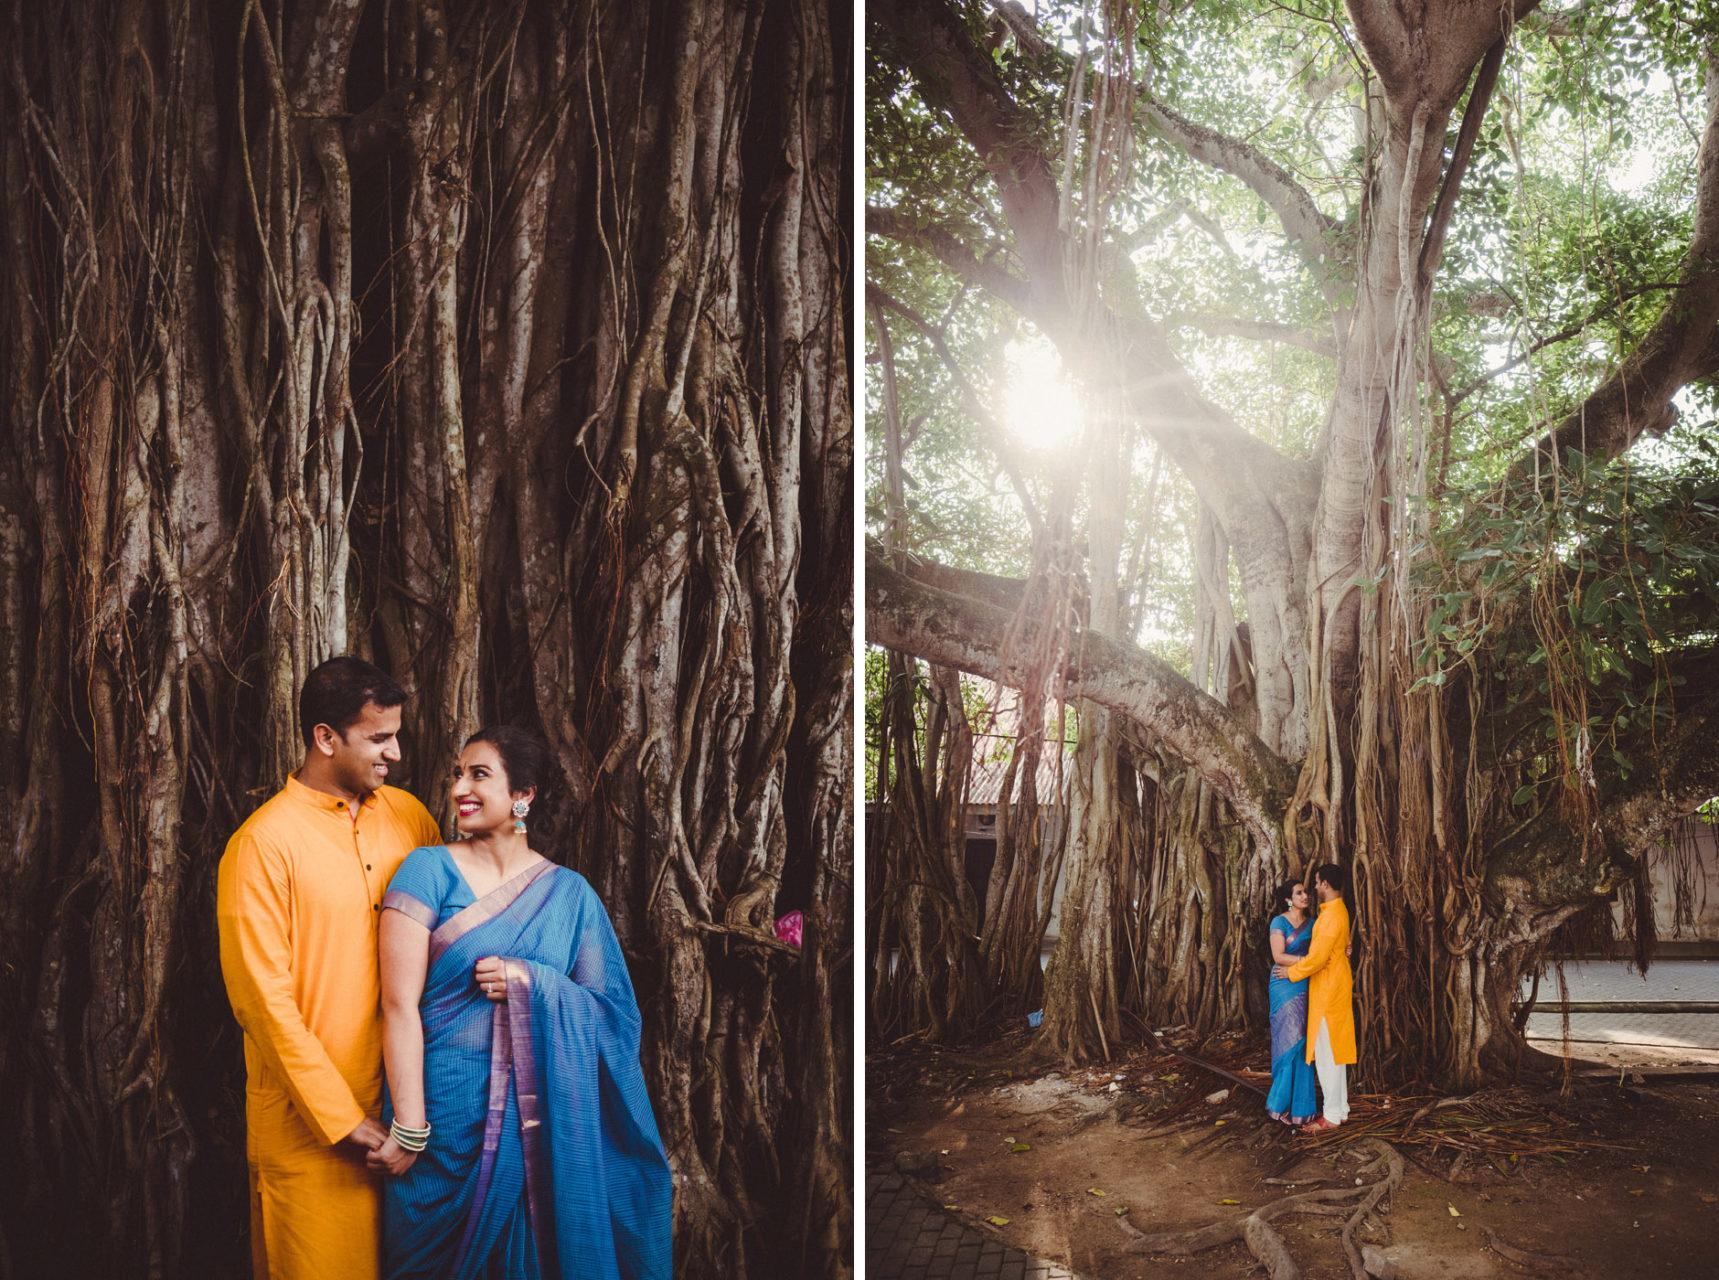 sri-lankan-wedding-photographer_kritdushan0045ab-1719x1280.jpg